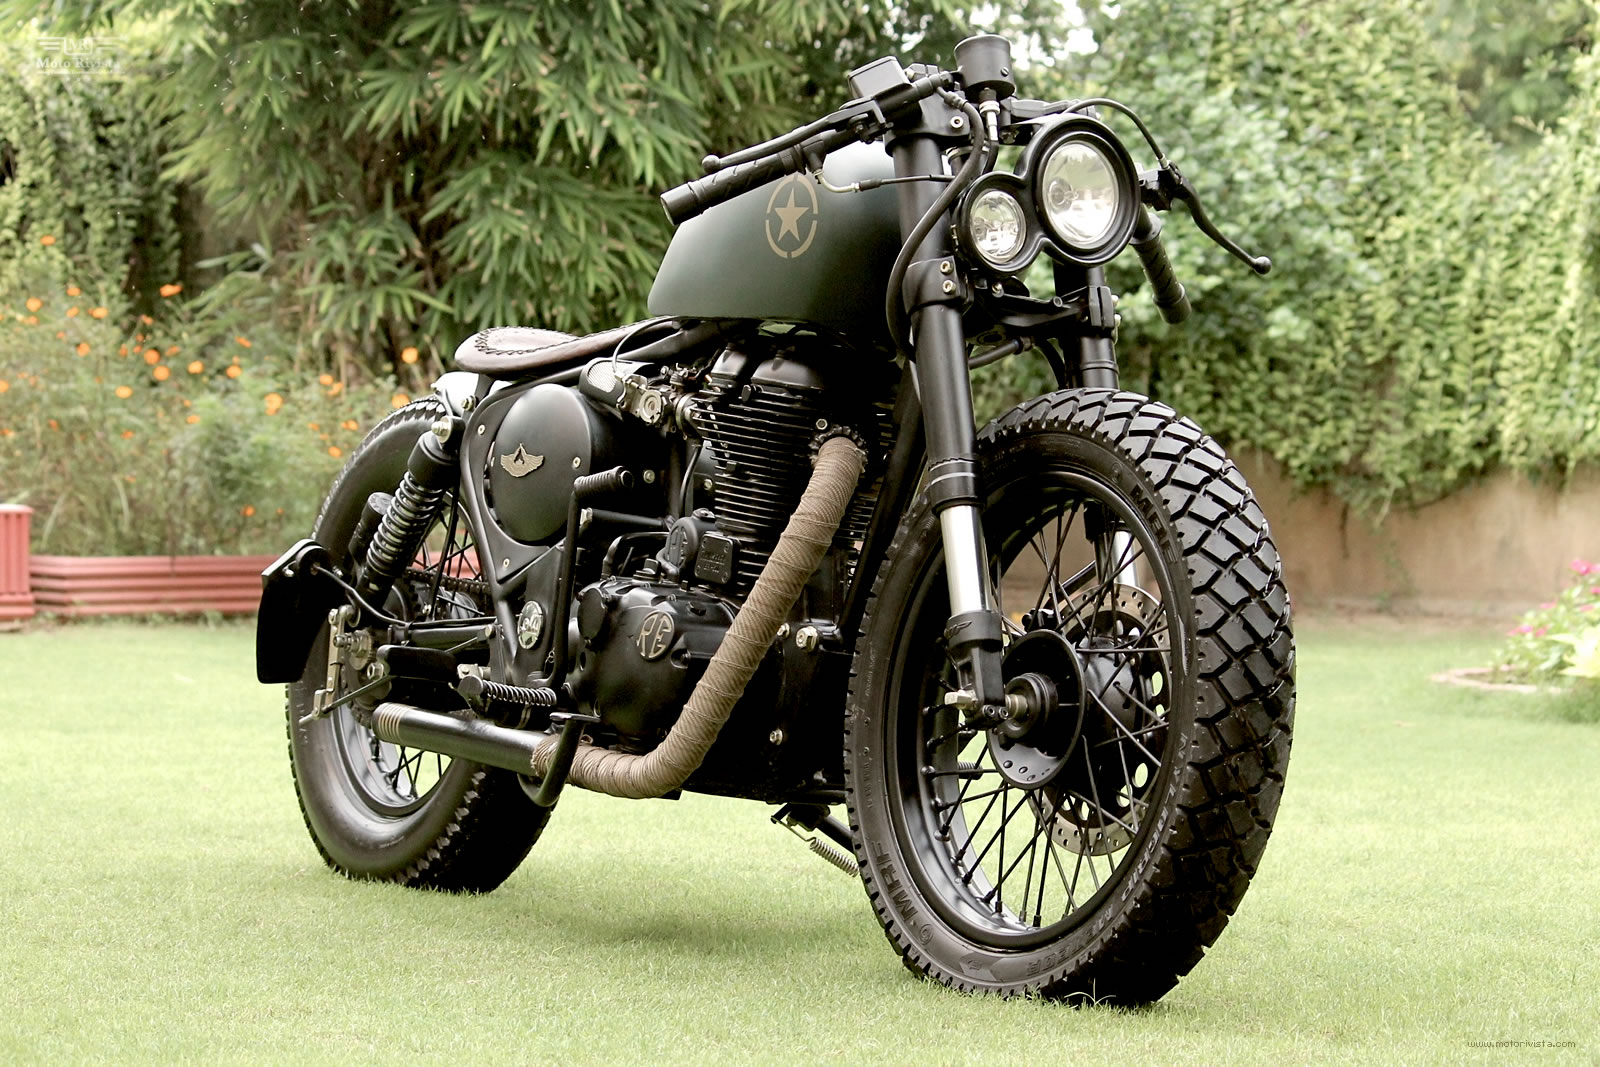 Custom-Royal-Enfield-500cc-Classic-by-Rajputana-customs-1